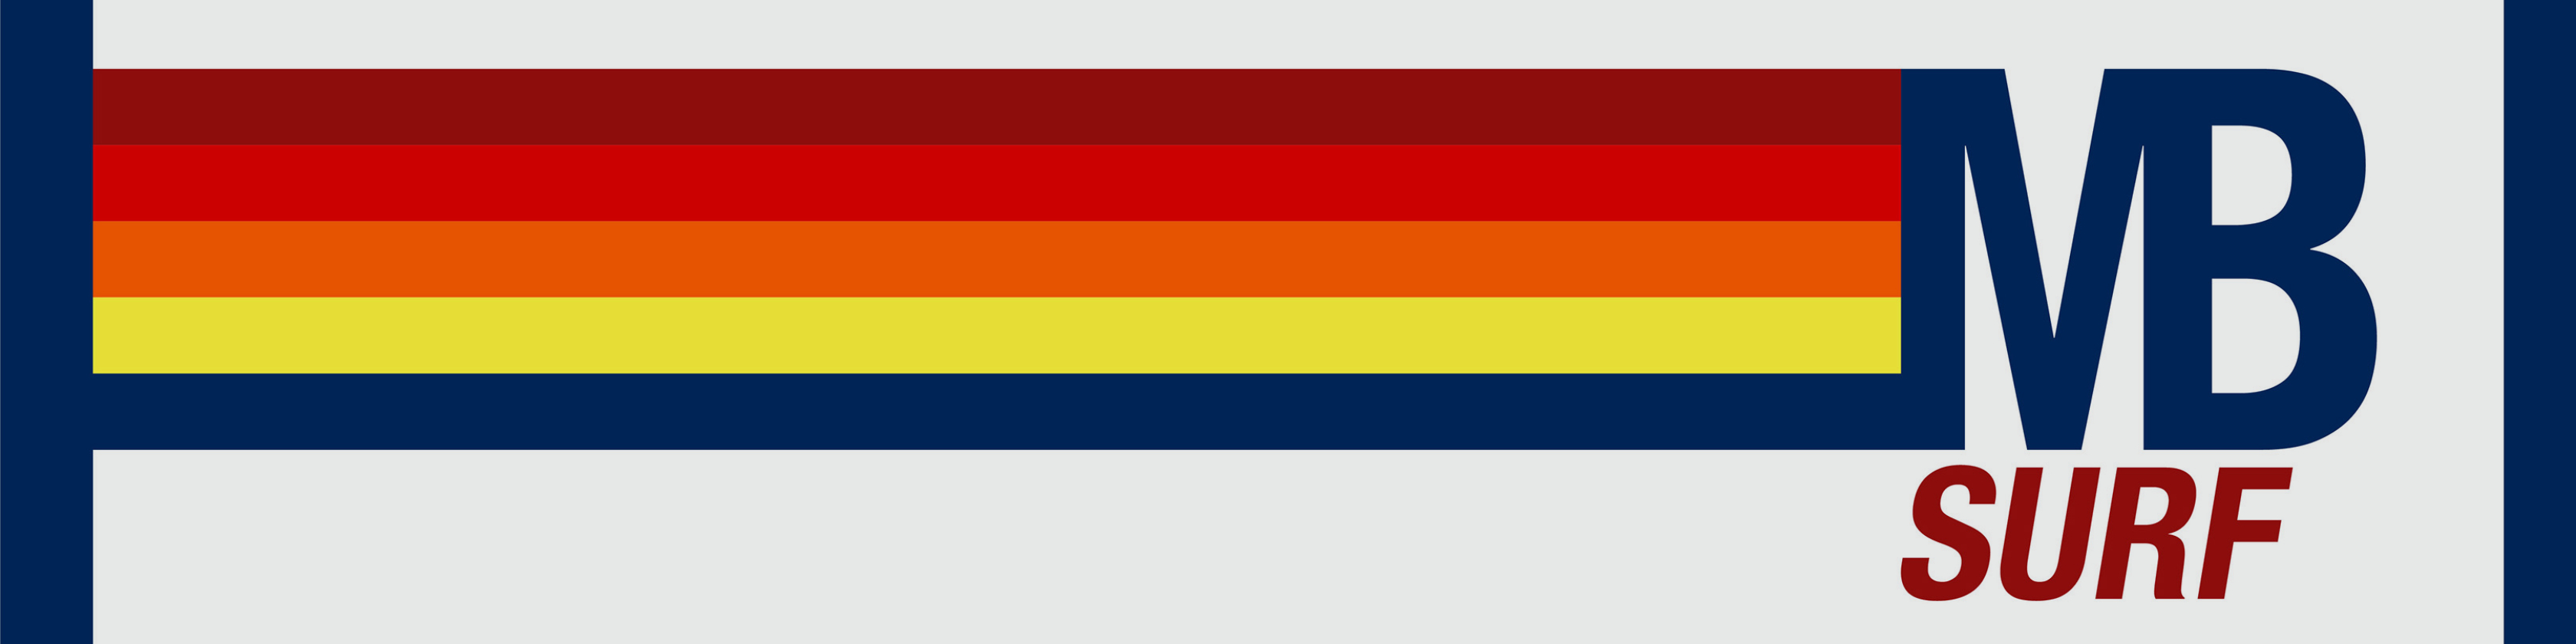 Mb surf horizontal logo